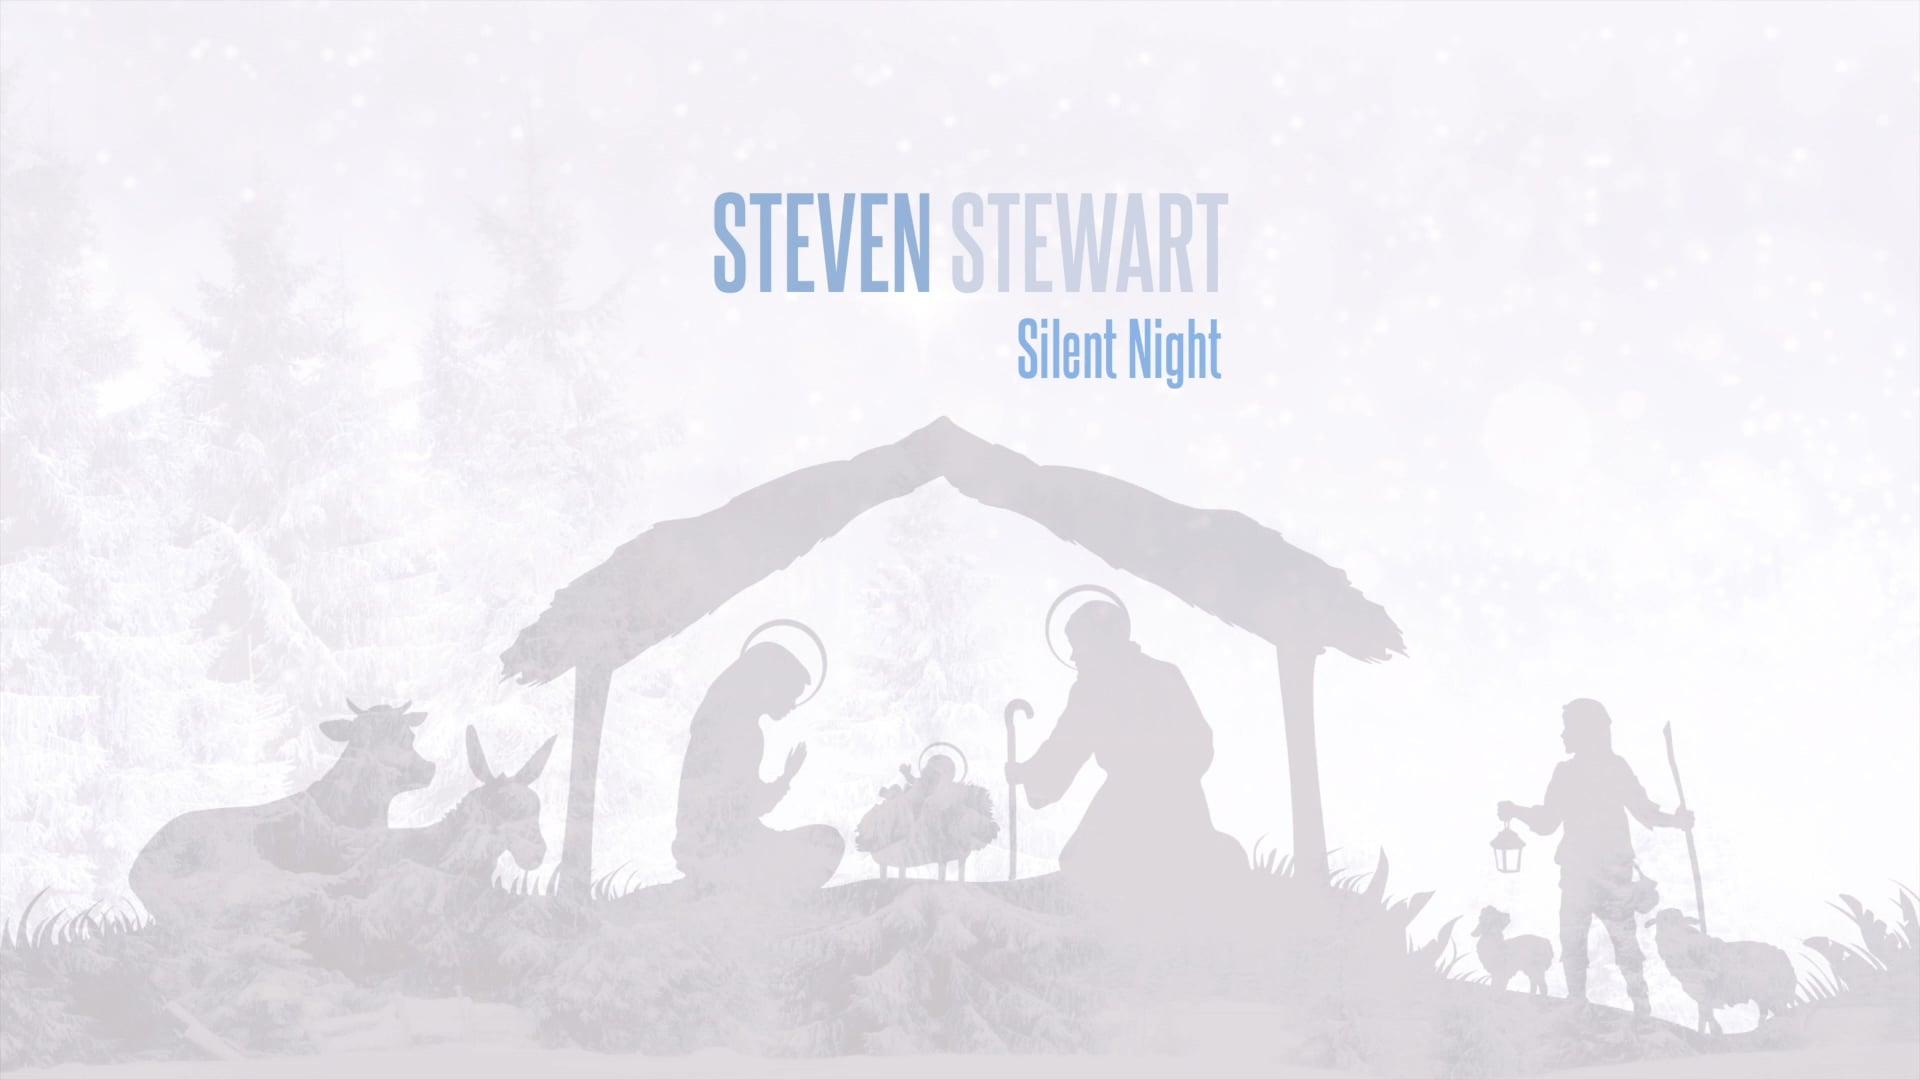 Silent Night - Steven Stewart